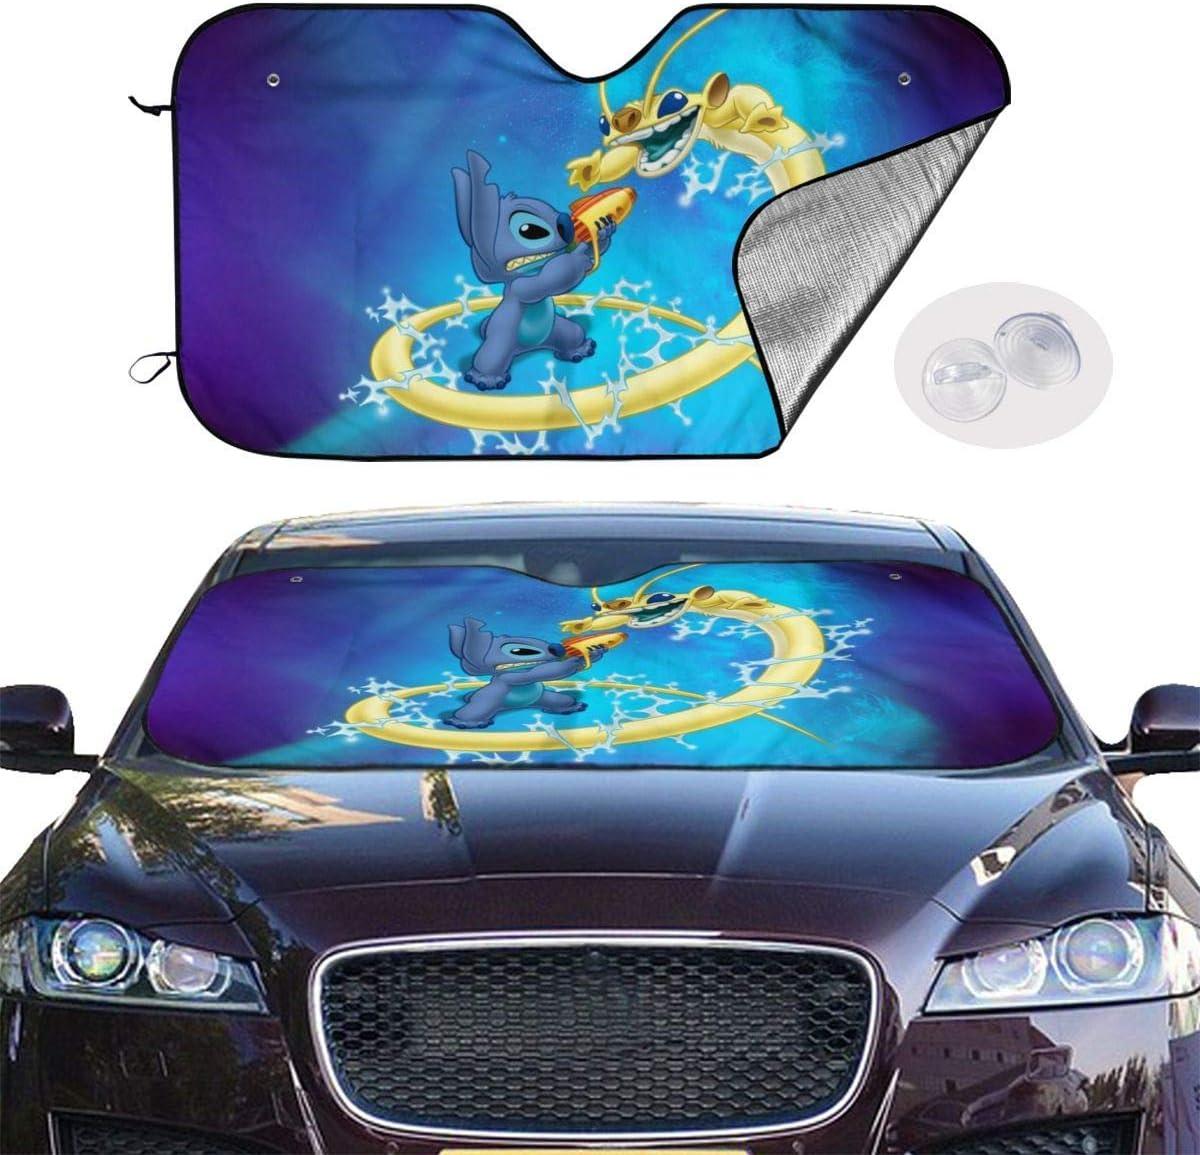 GFHTH Lilo Stitch Windshield Sun Shades Blocks Rayos UV Sun Visor Plegable Car Universal Car Sunshades Shield Protector de la Cubierta con 4 ventosas 30x55 Pulgadas